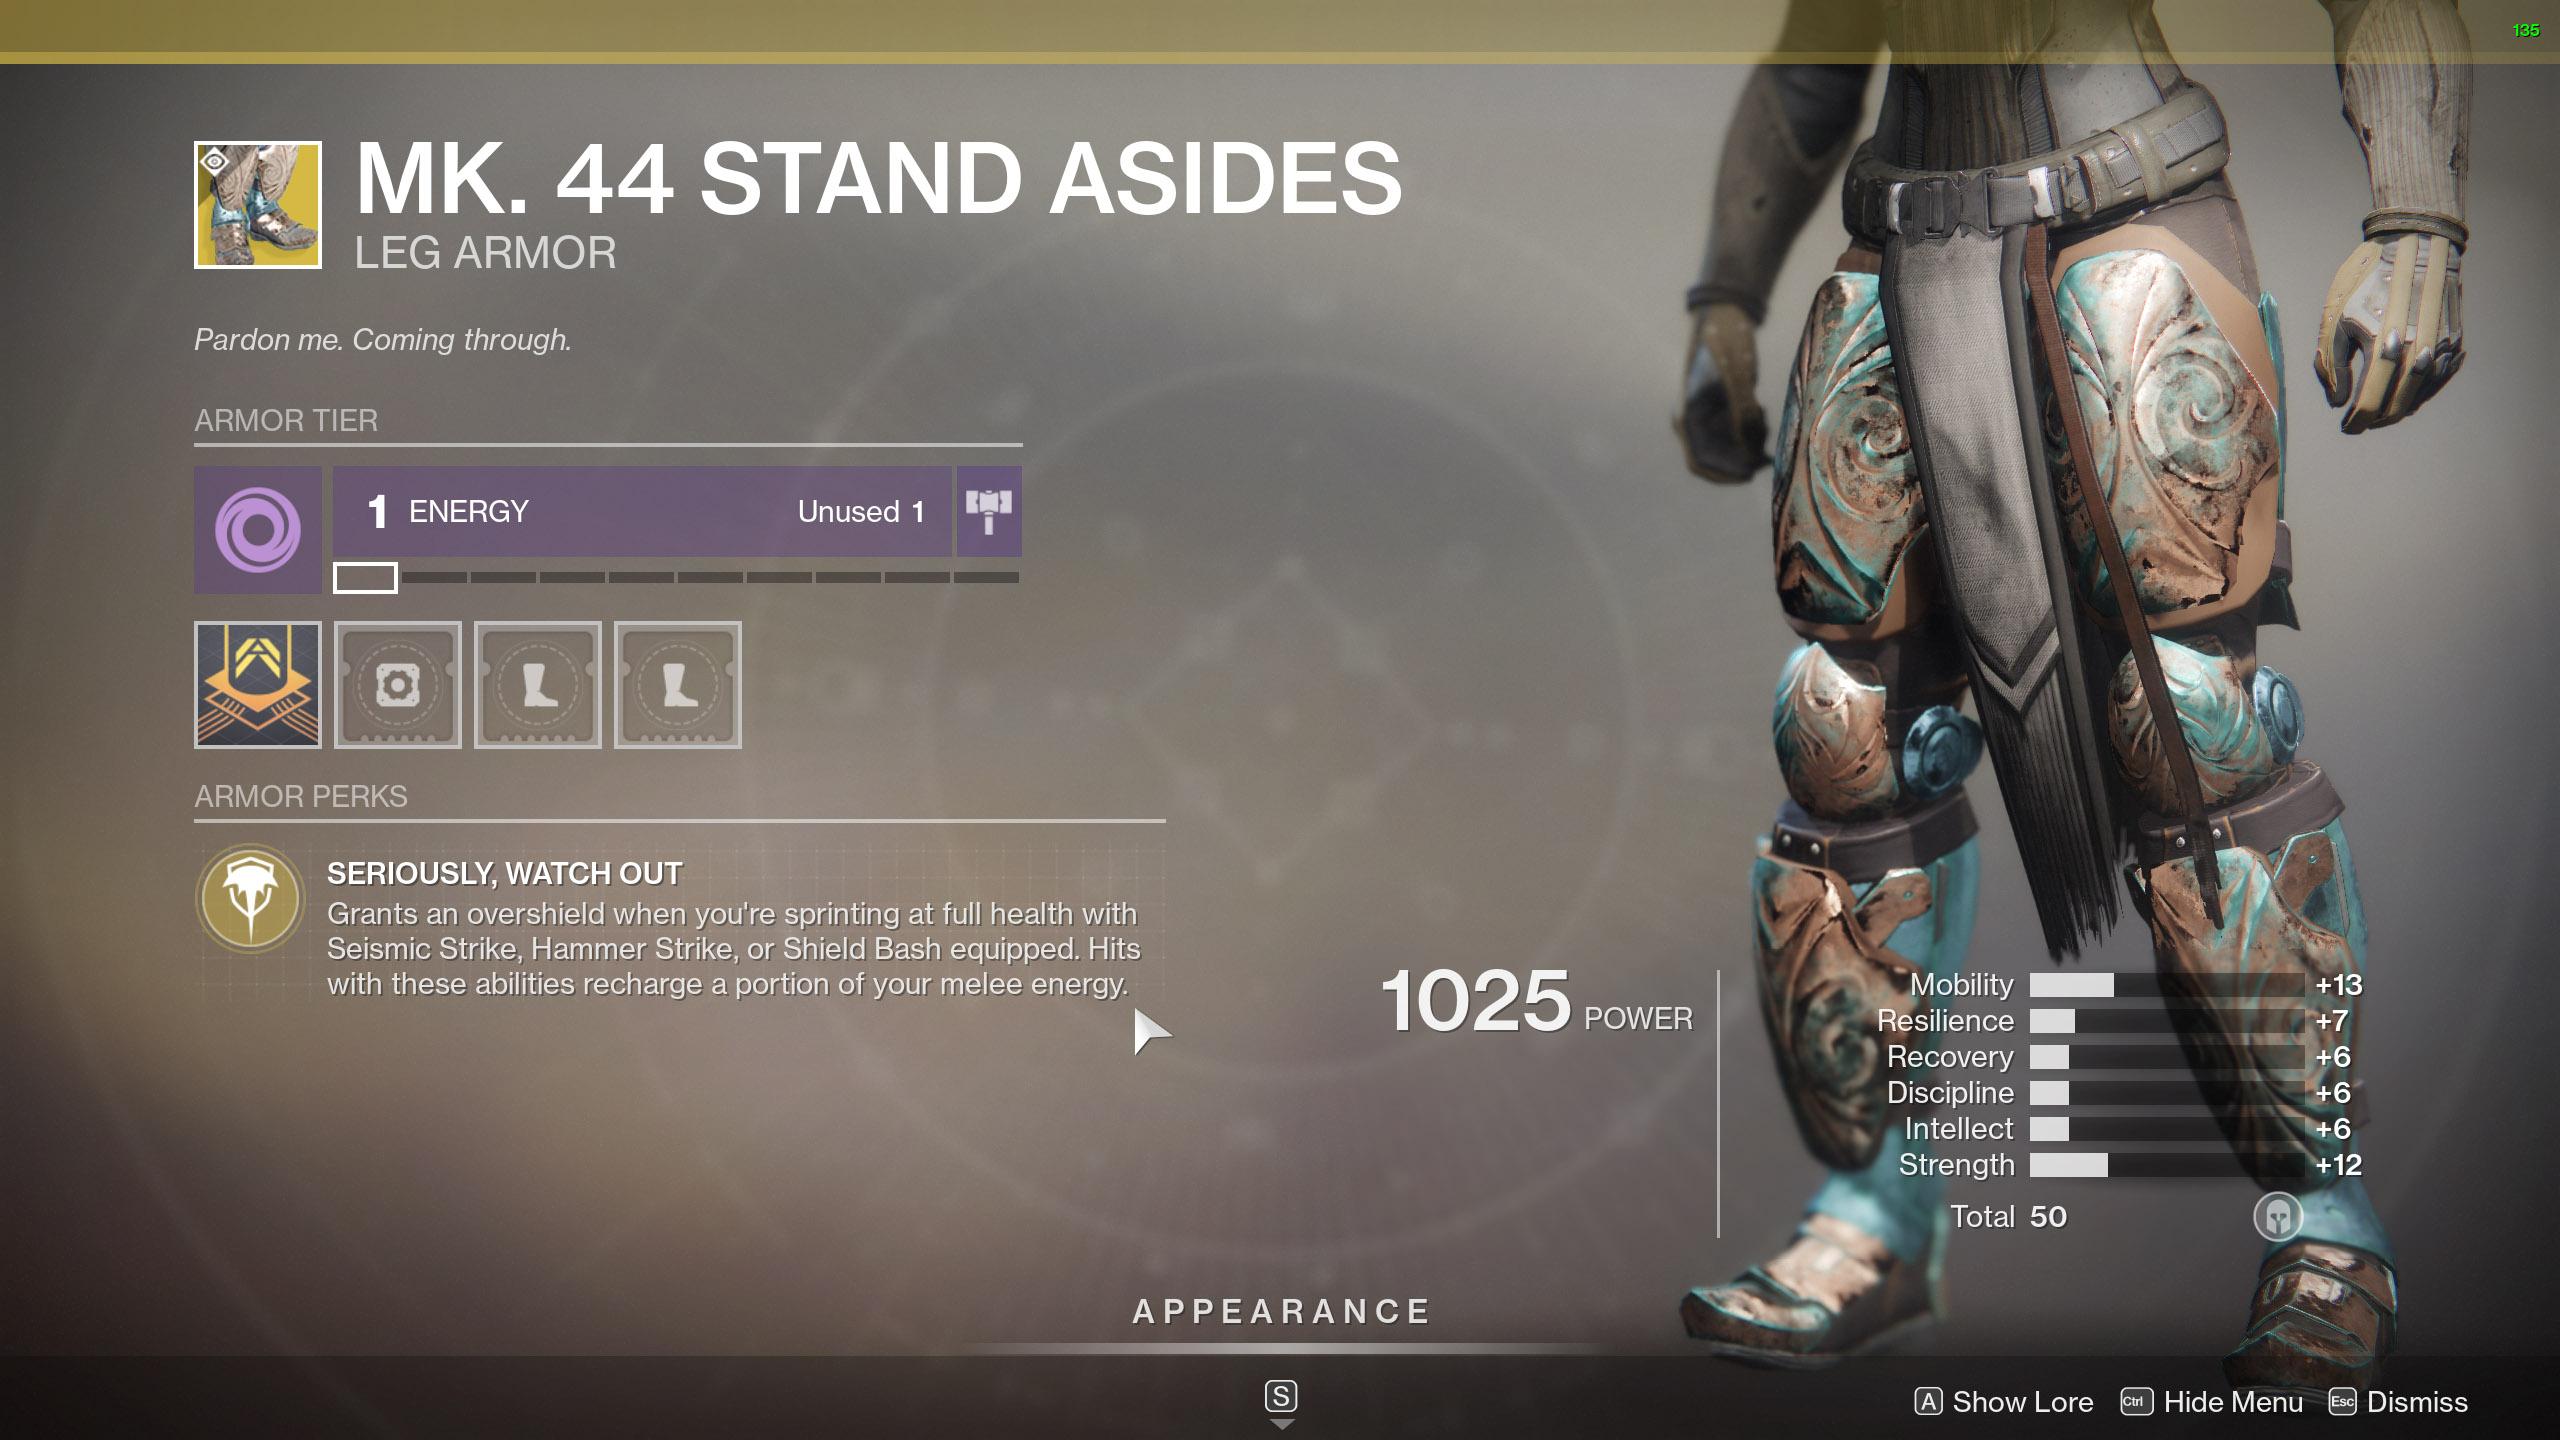 Destiny 2 Exotic Titan Armor MK. 44 Stand Asides